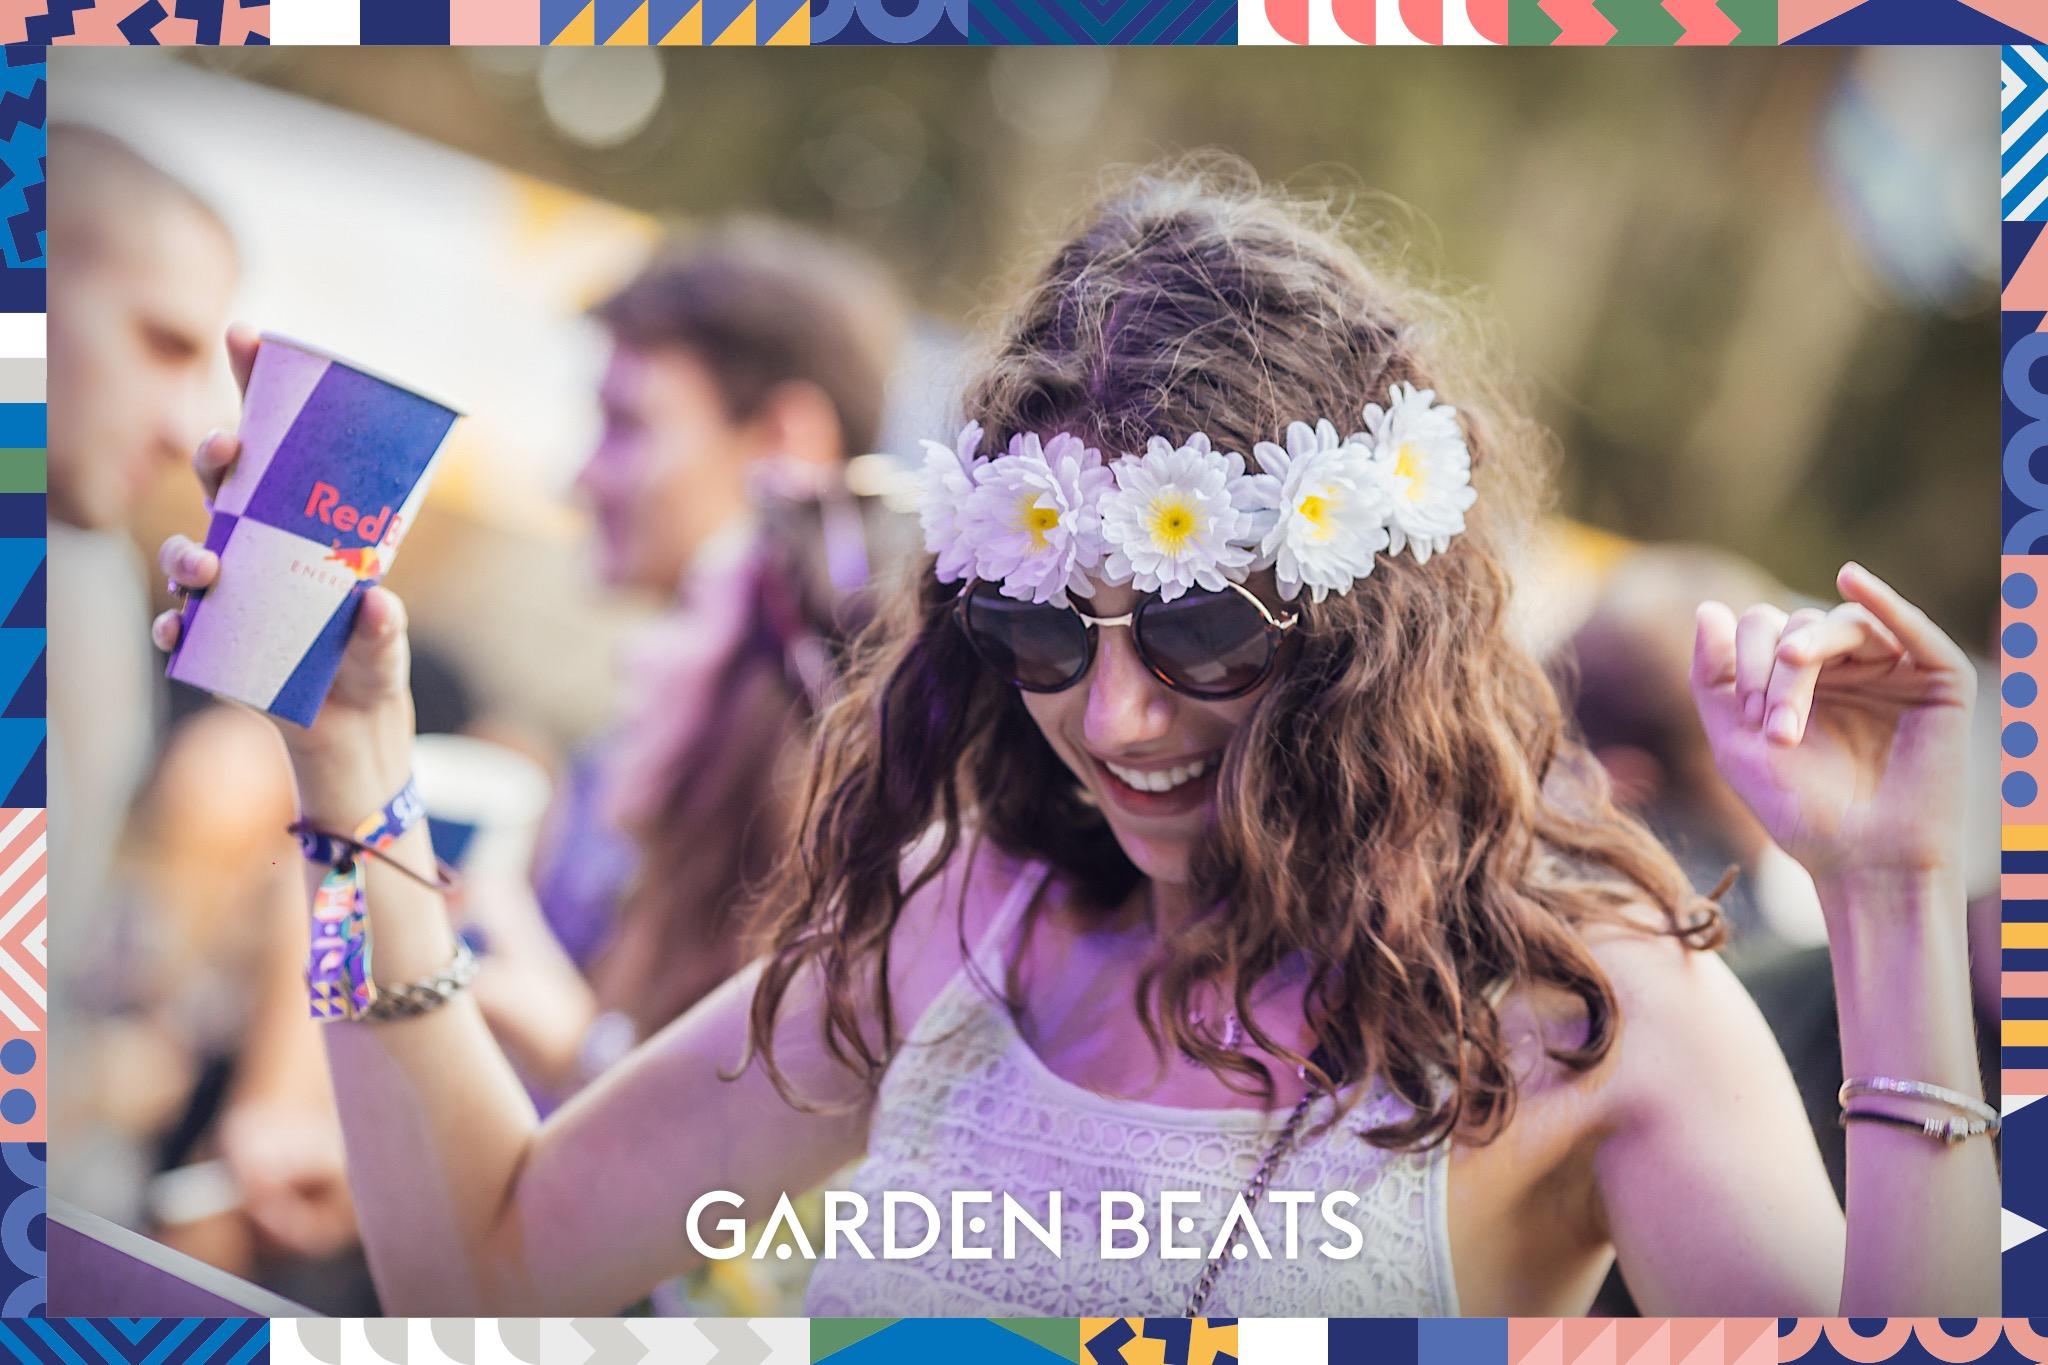 18032017_GardenBeats_Colossal590_WatermarkedGB.jpg